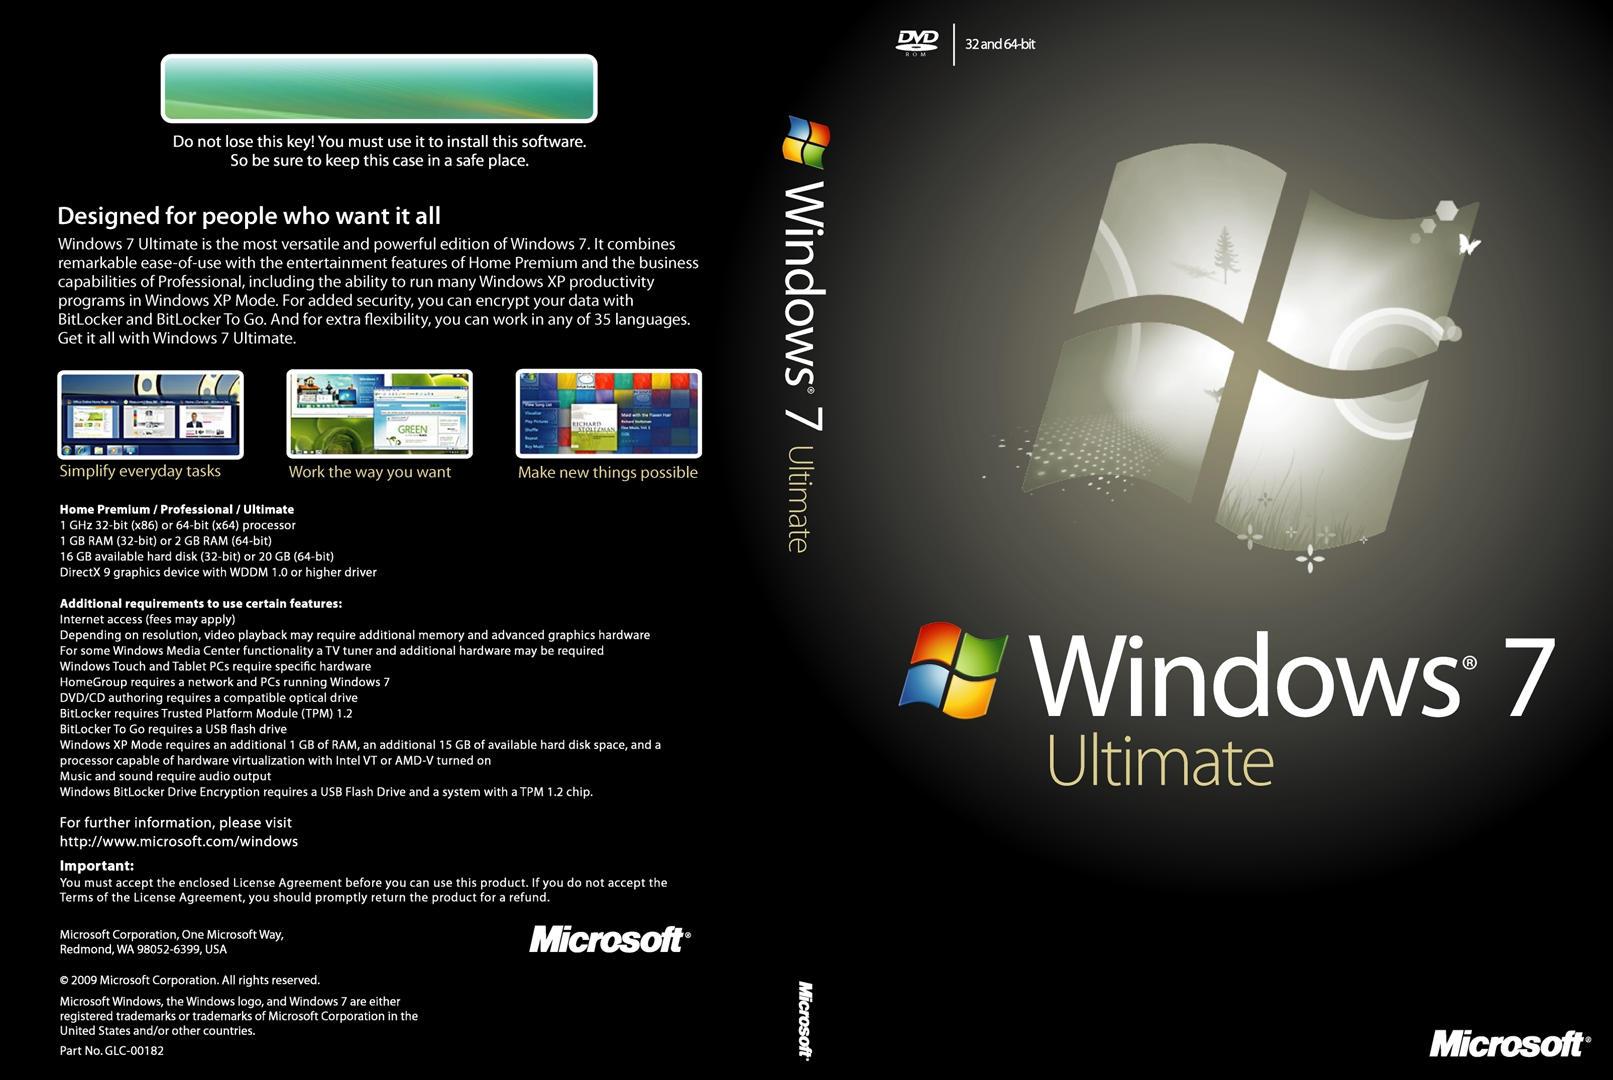 Windows 7 Ultimate 最終繁體中文免激活旗艦版-Windows 軟體下載-Windows 軟體交流-Android 臺灣中文網 - APK.TW